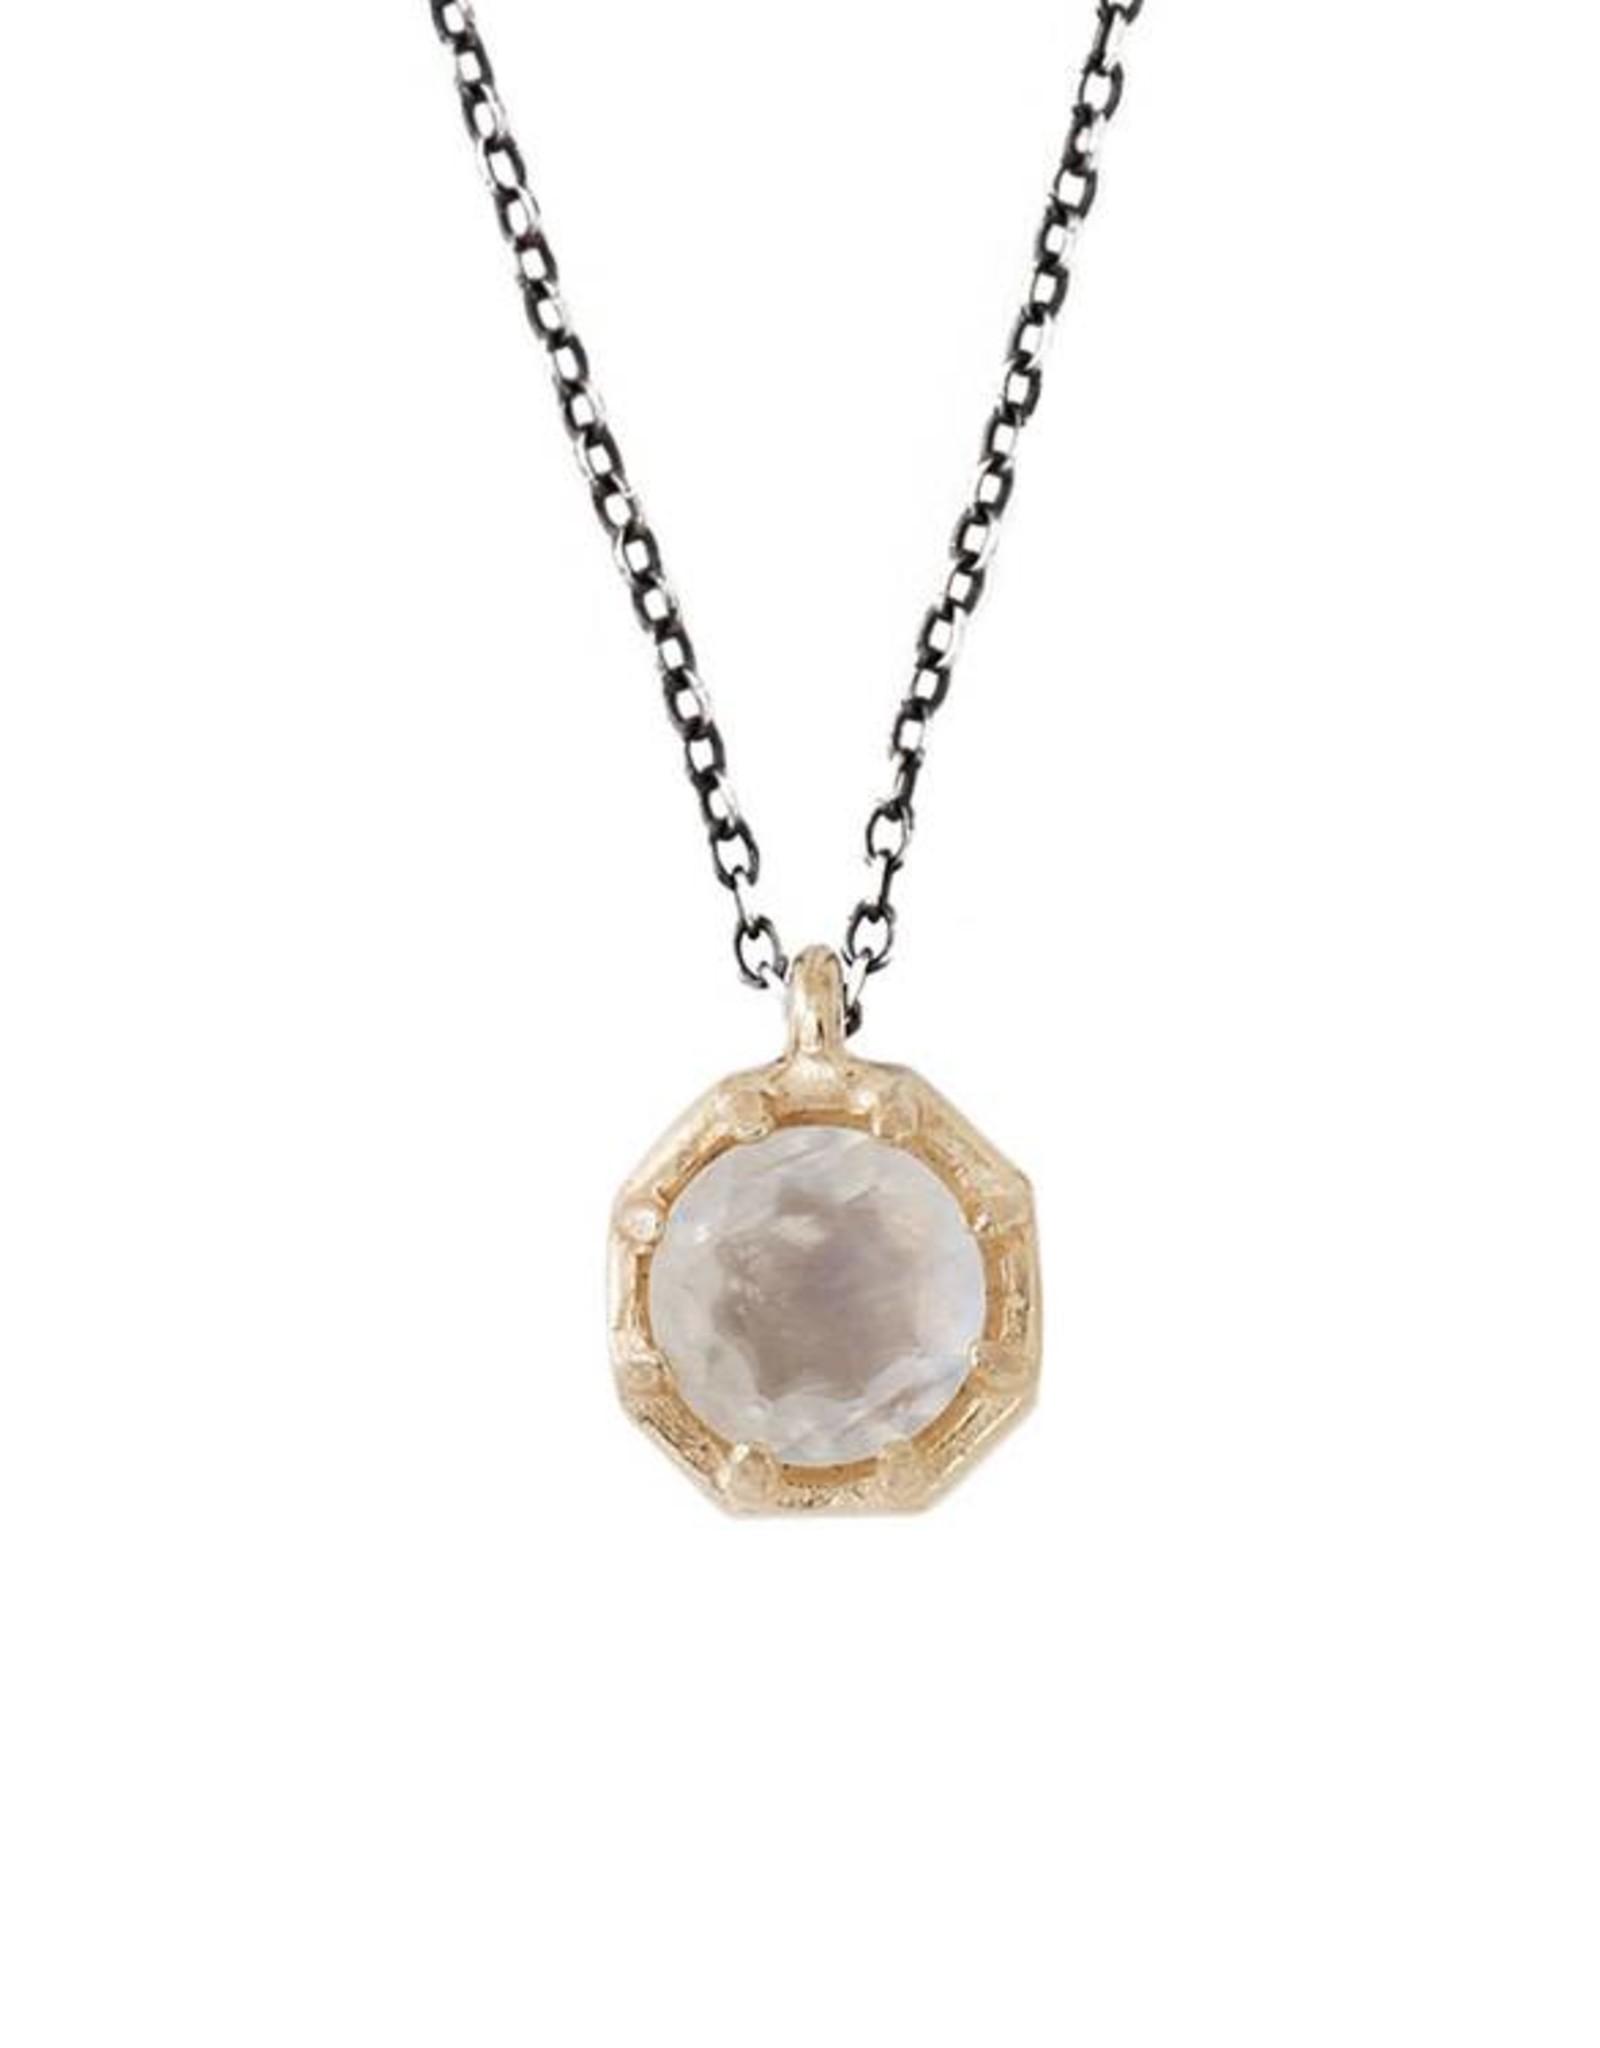 Lauren Wolf Jewelry Gold Octagon Necklace - Rainbow Moonstone